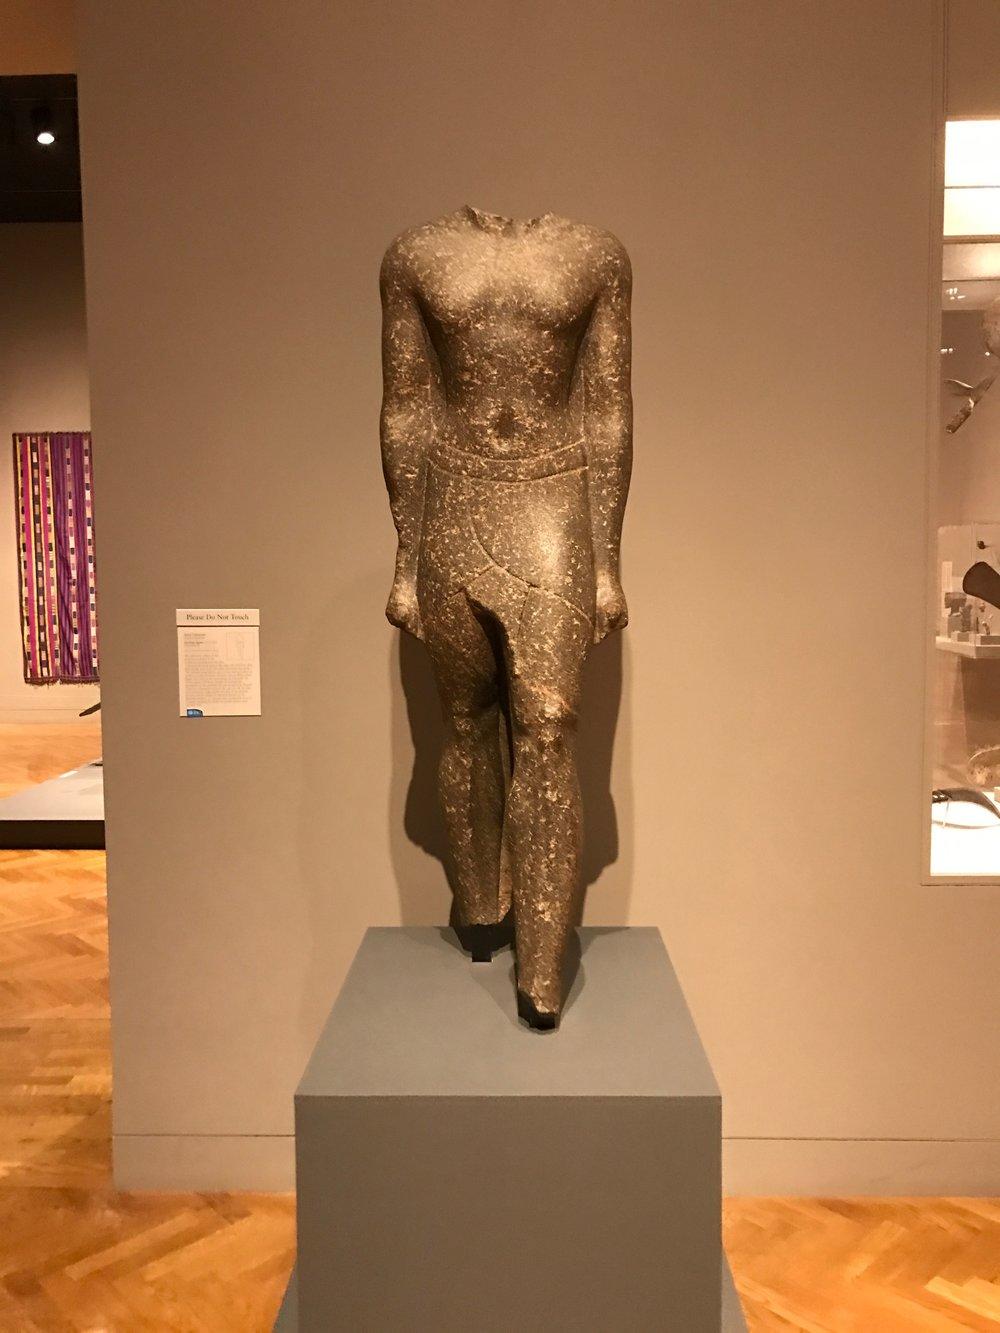 Egyptian Statue - Minneapolis Institute of Arts